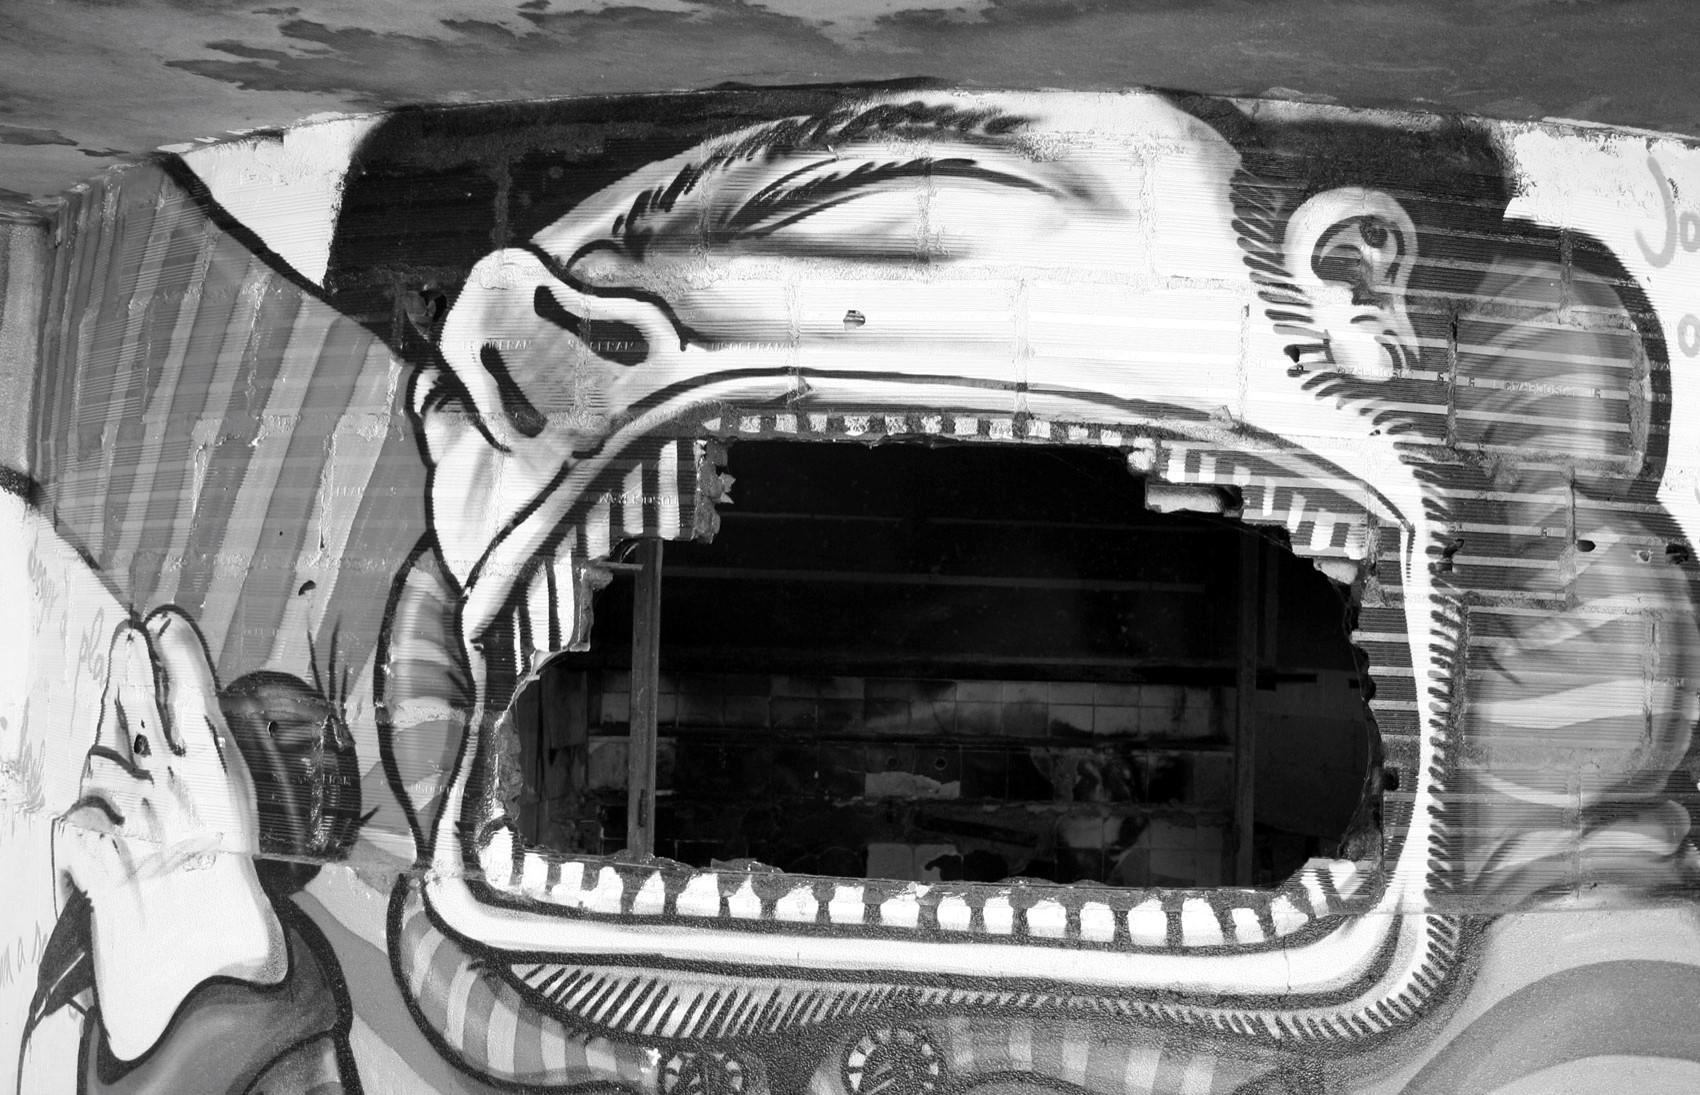 Detalle. Graffiti in abandoned hotel, Monte Estoril, Portugal - 2008